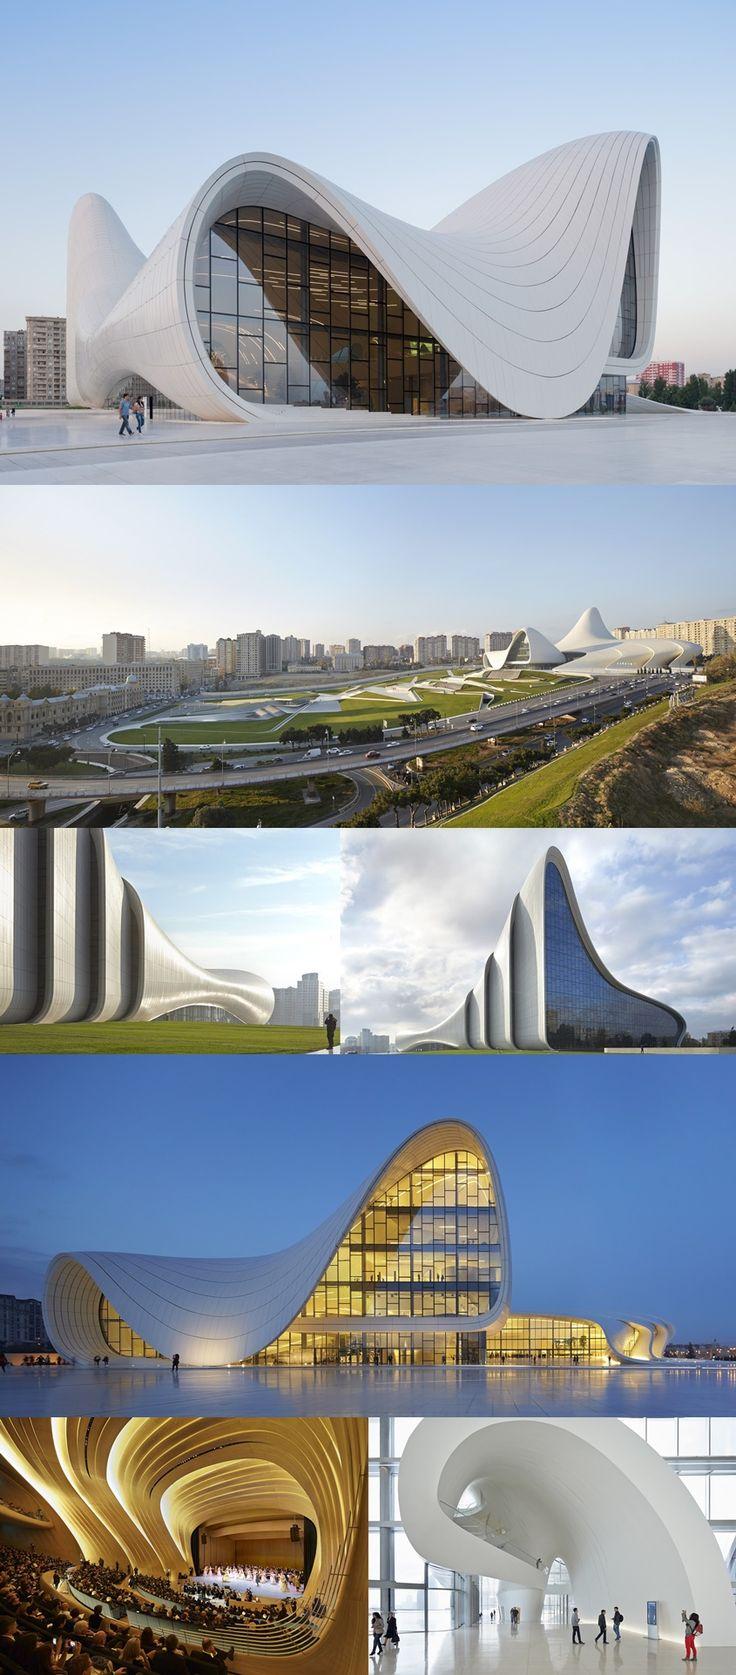 Heyd r liyev m rk zi heydar aliyev center by zaha hadid for Arquitectura zaha hadid